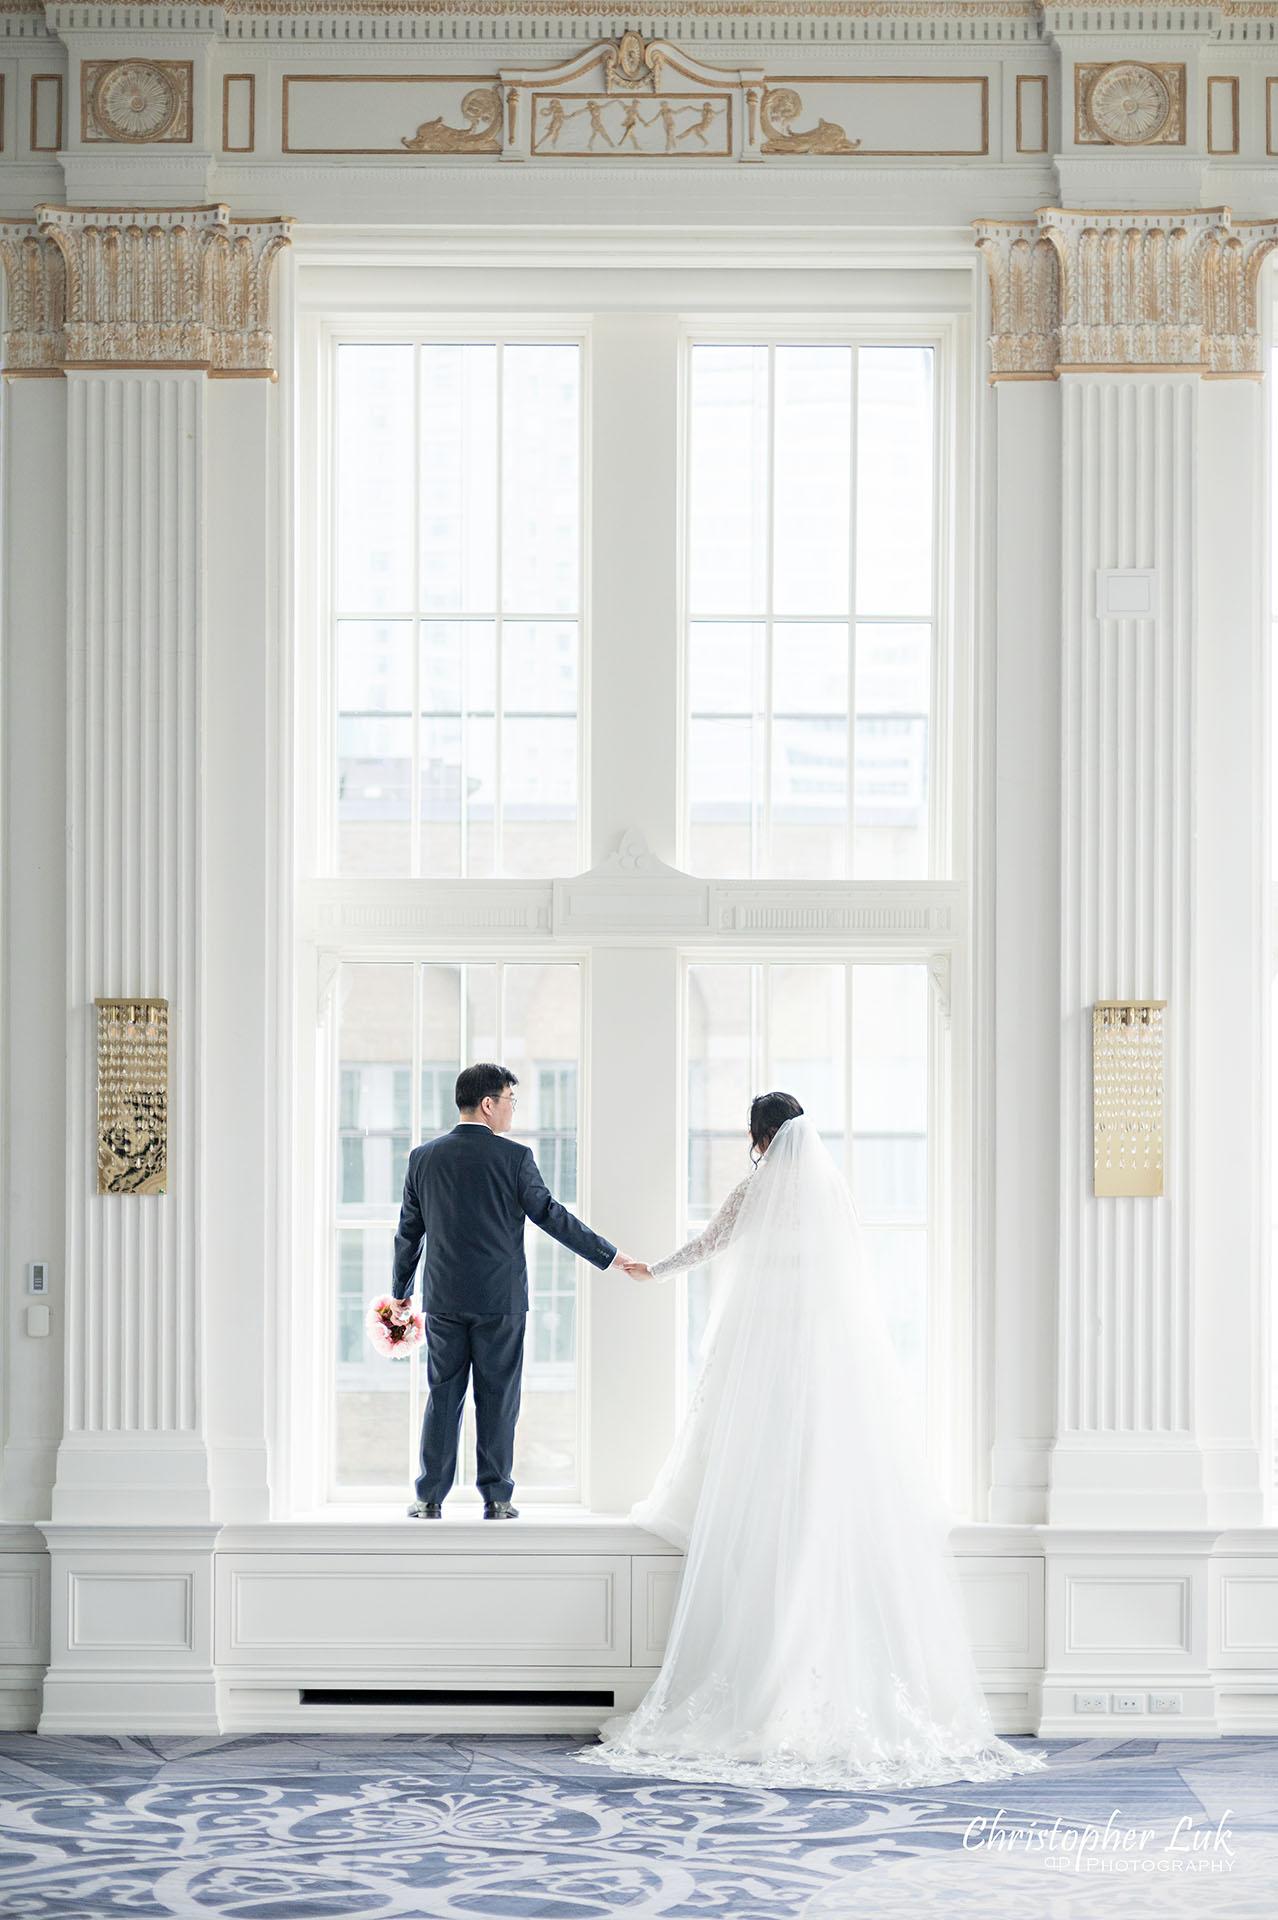 King Edward Hotel Crystal Ballroom Toronto Wedding Photographer MicroWedding Bride Groom Window Frame Long Train Bridal Dress Gown Cathedral Veil Holding Hands